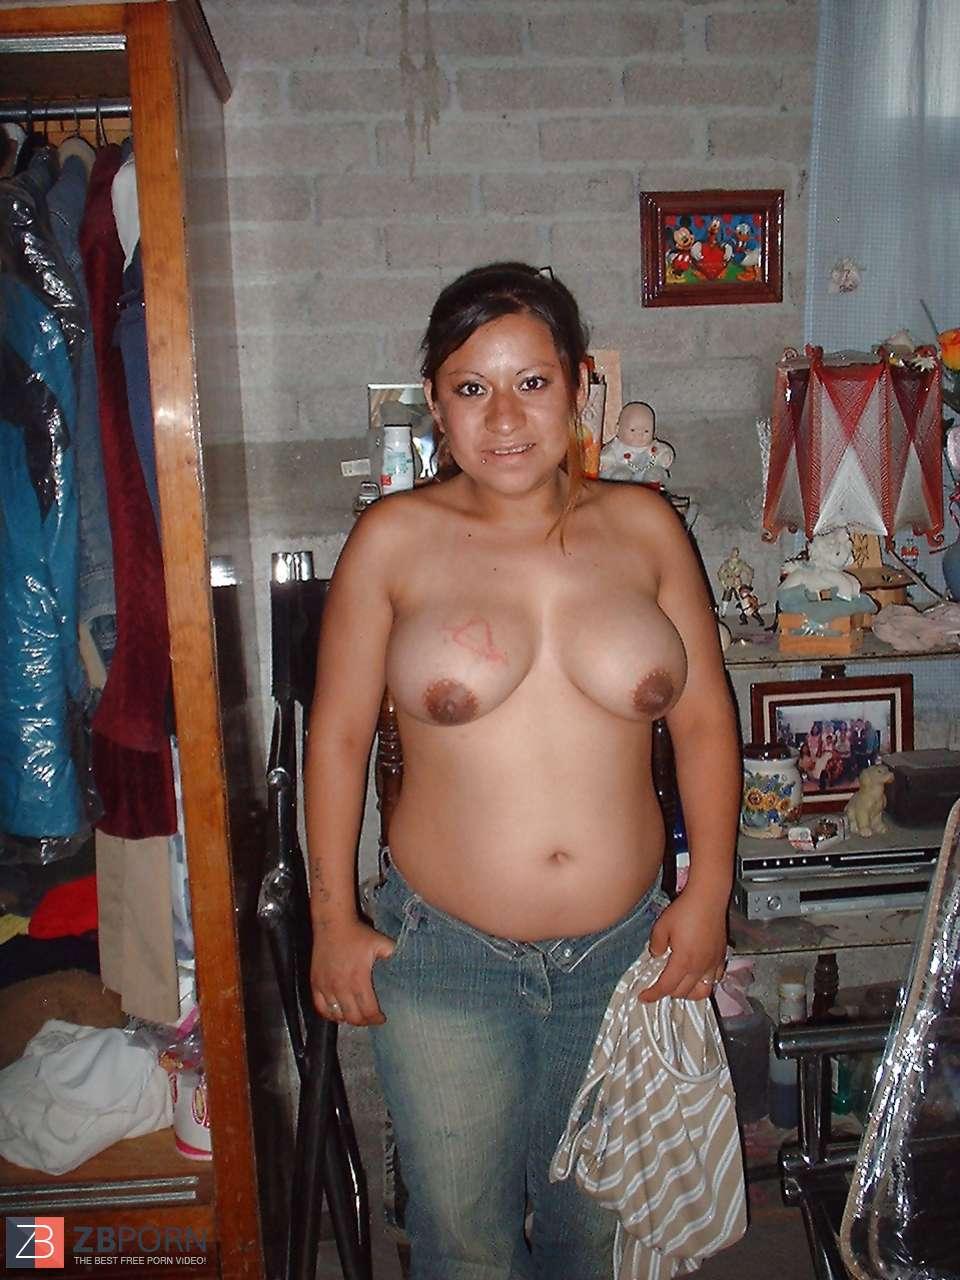 Ama de casa culona peluda posando 27pose1 8